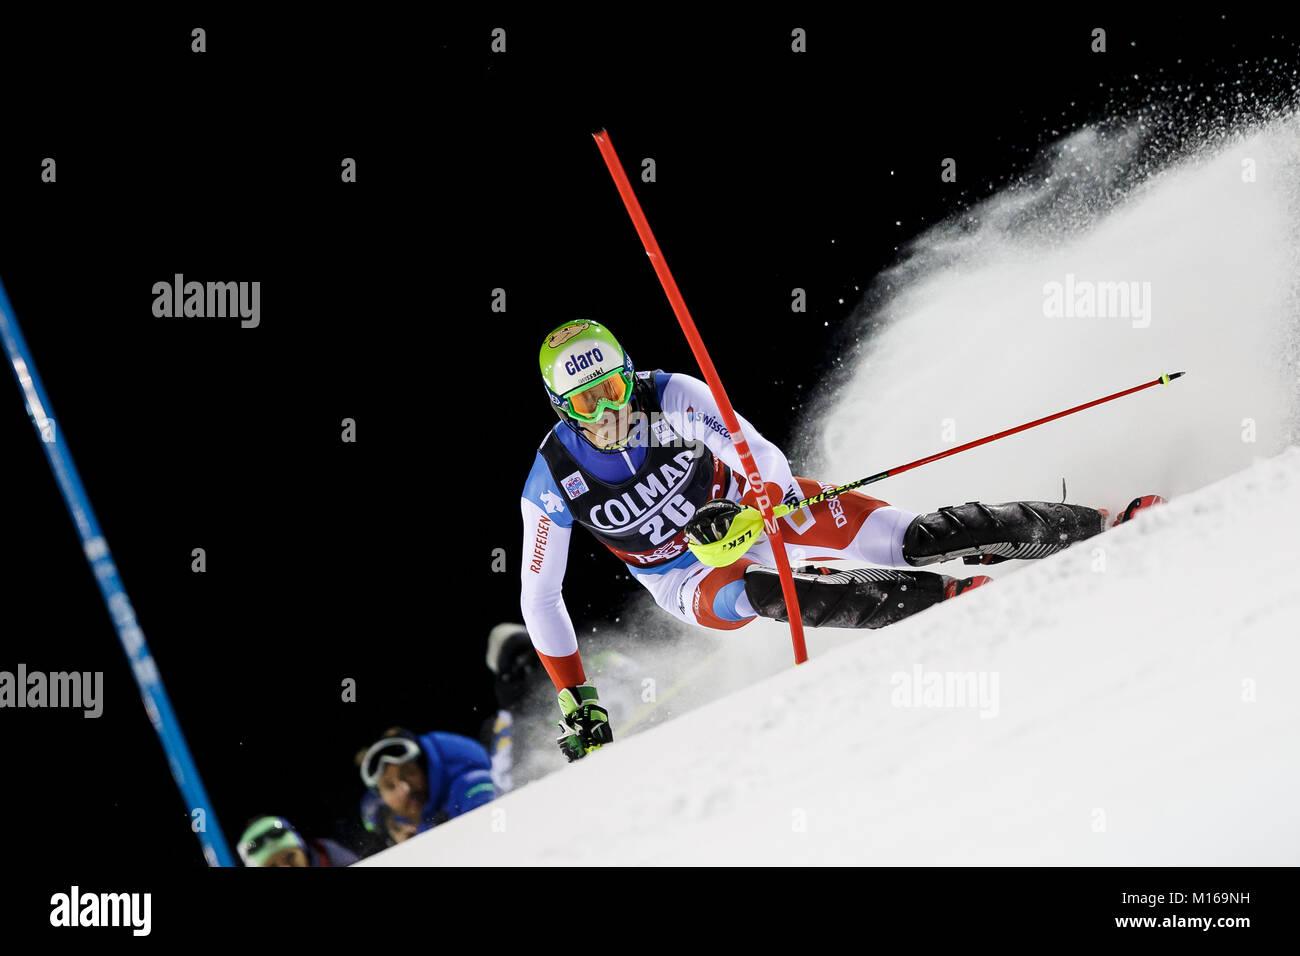 Madonna di Campiglio, Italy 22 December 2017.  ZENHAEUSERN Ramon (Swi) competing in the Audi Fis Alpine Skiing World - Stock Image